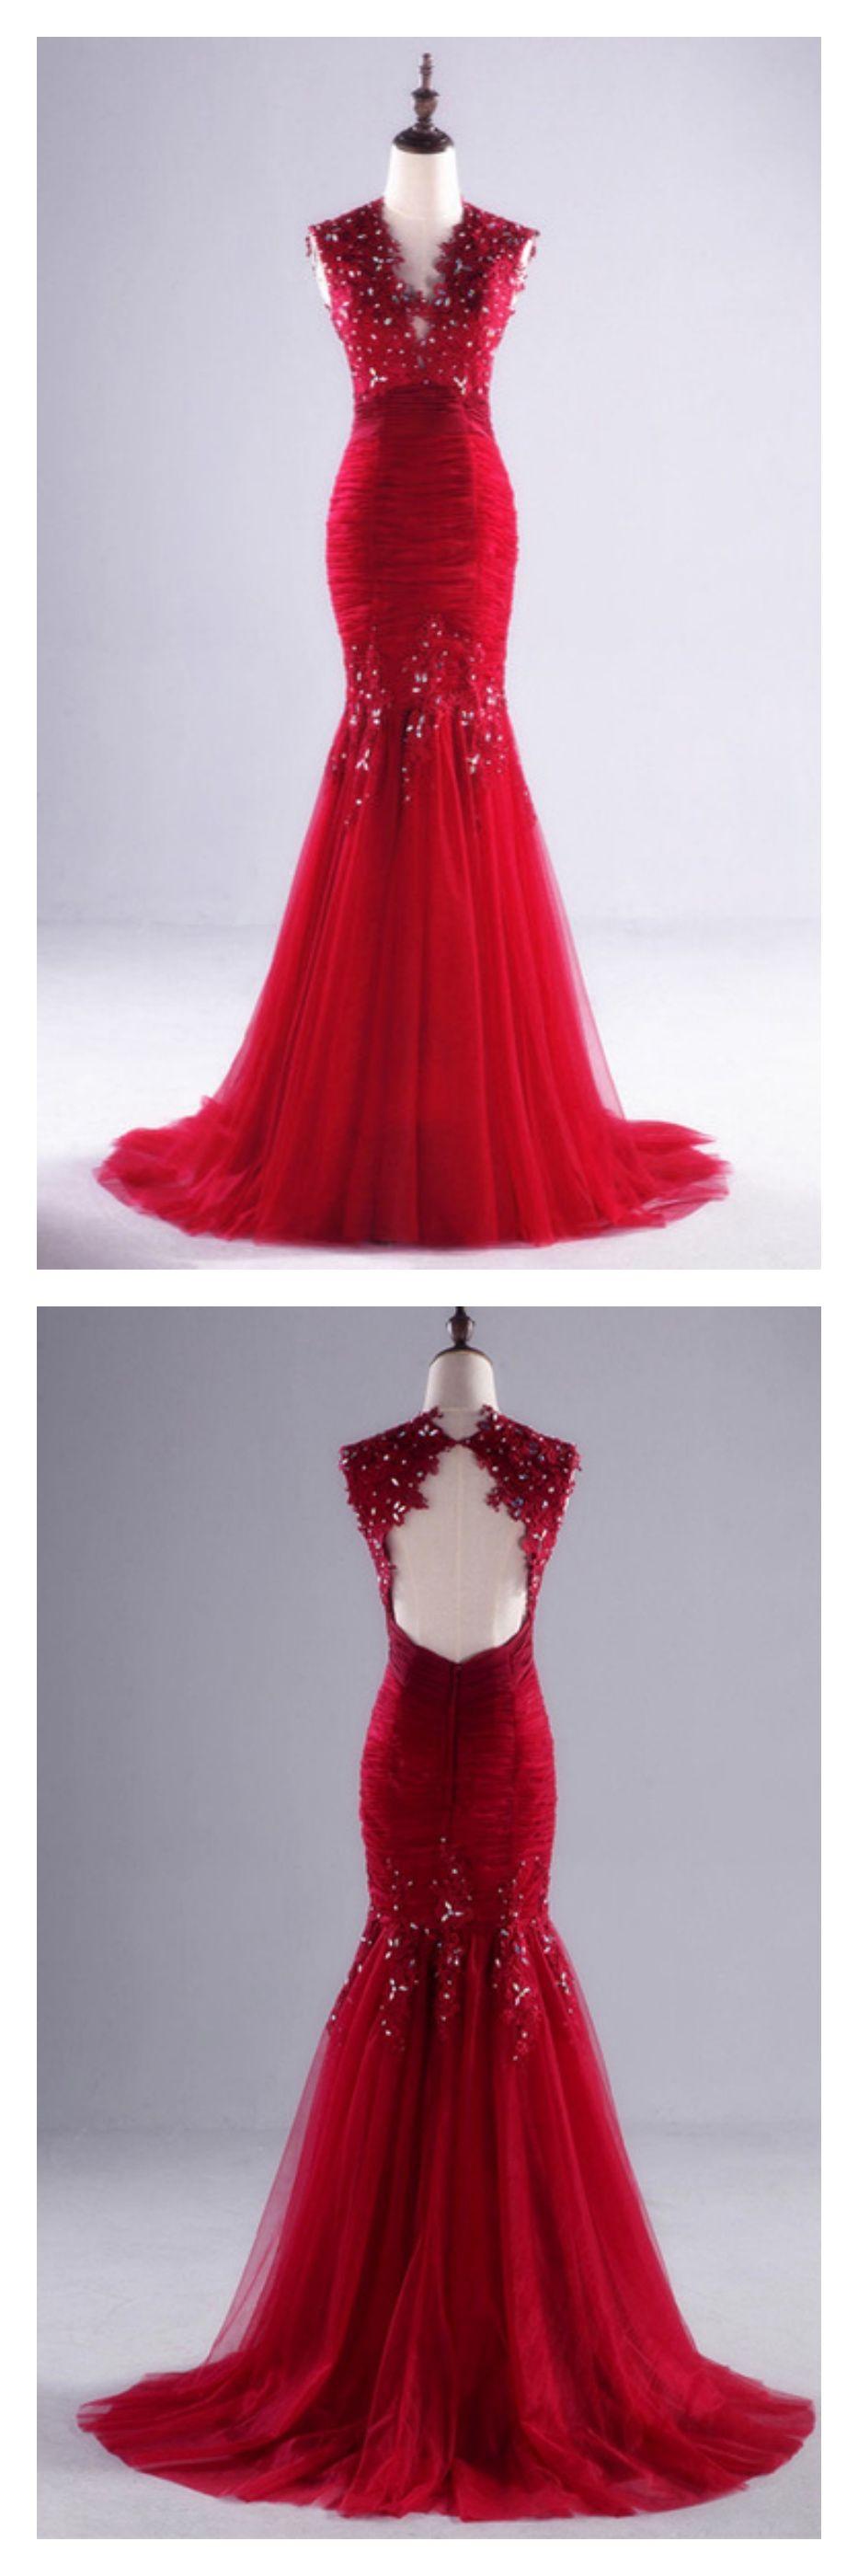 Red applique long mermaid prom dresses evening dresses ed